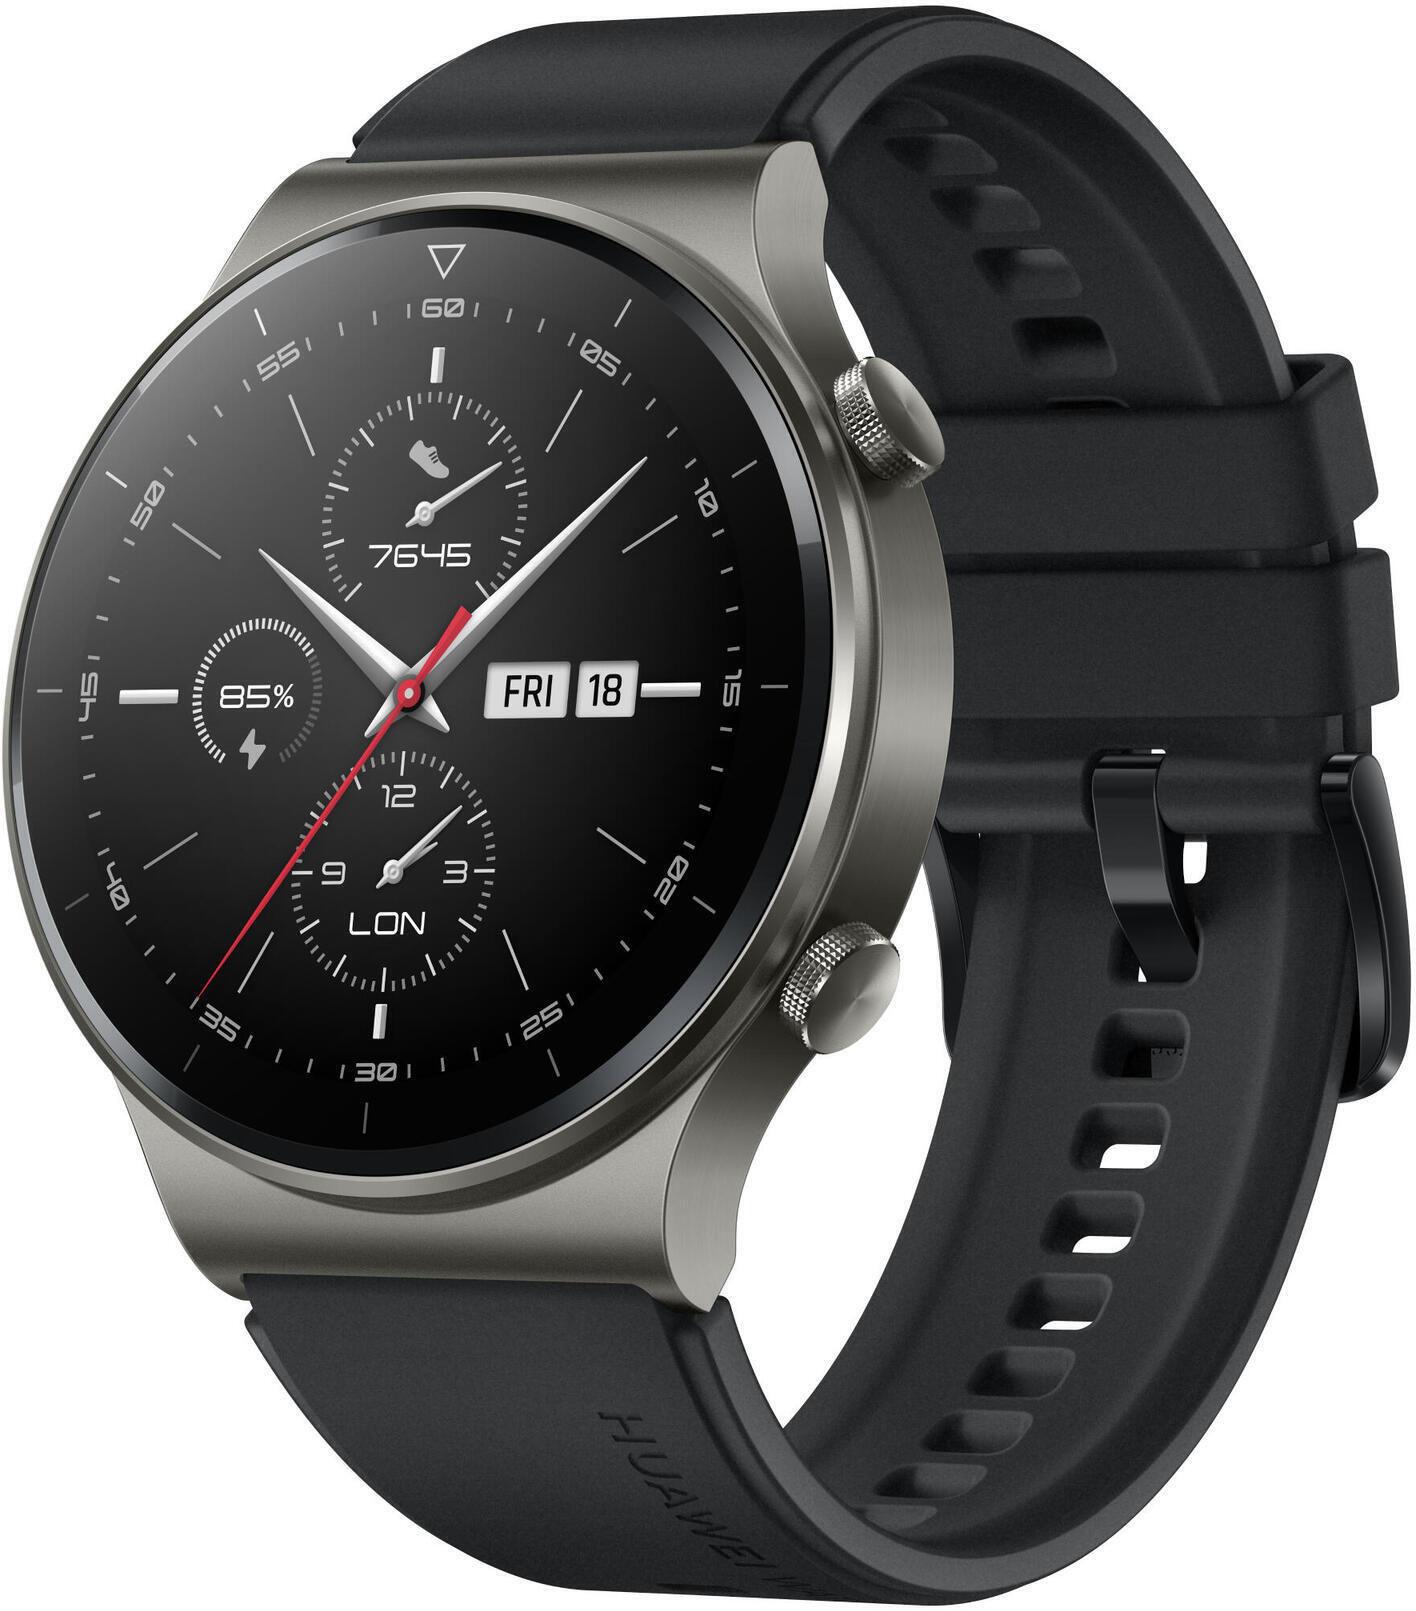 Smartwatch Huawei Watch Gt 2 Pro Black